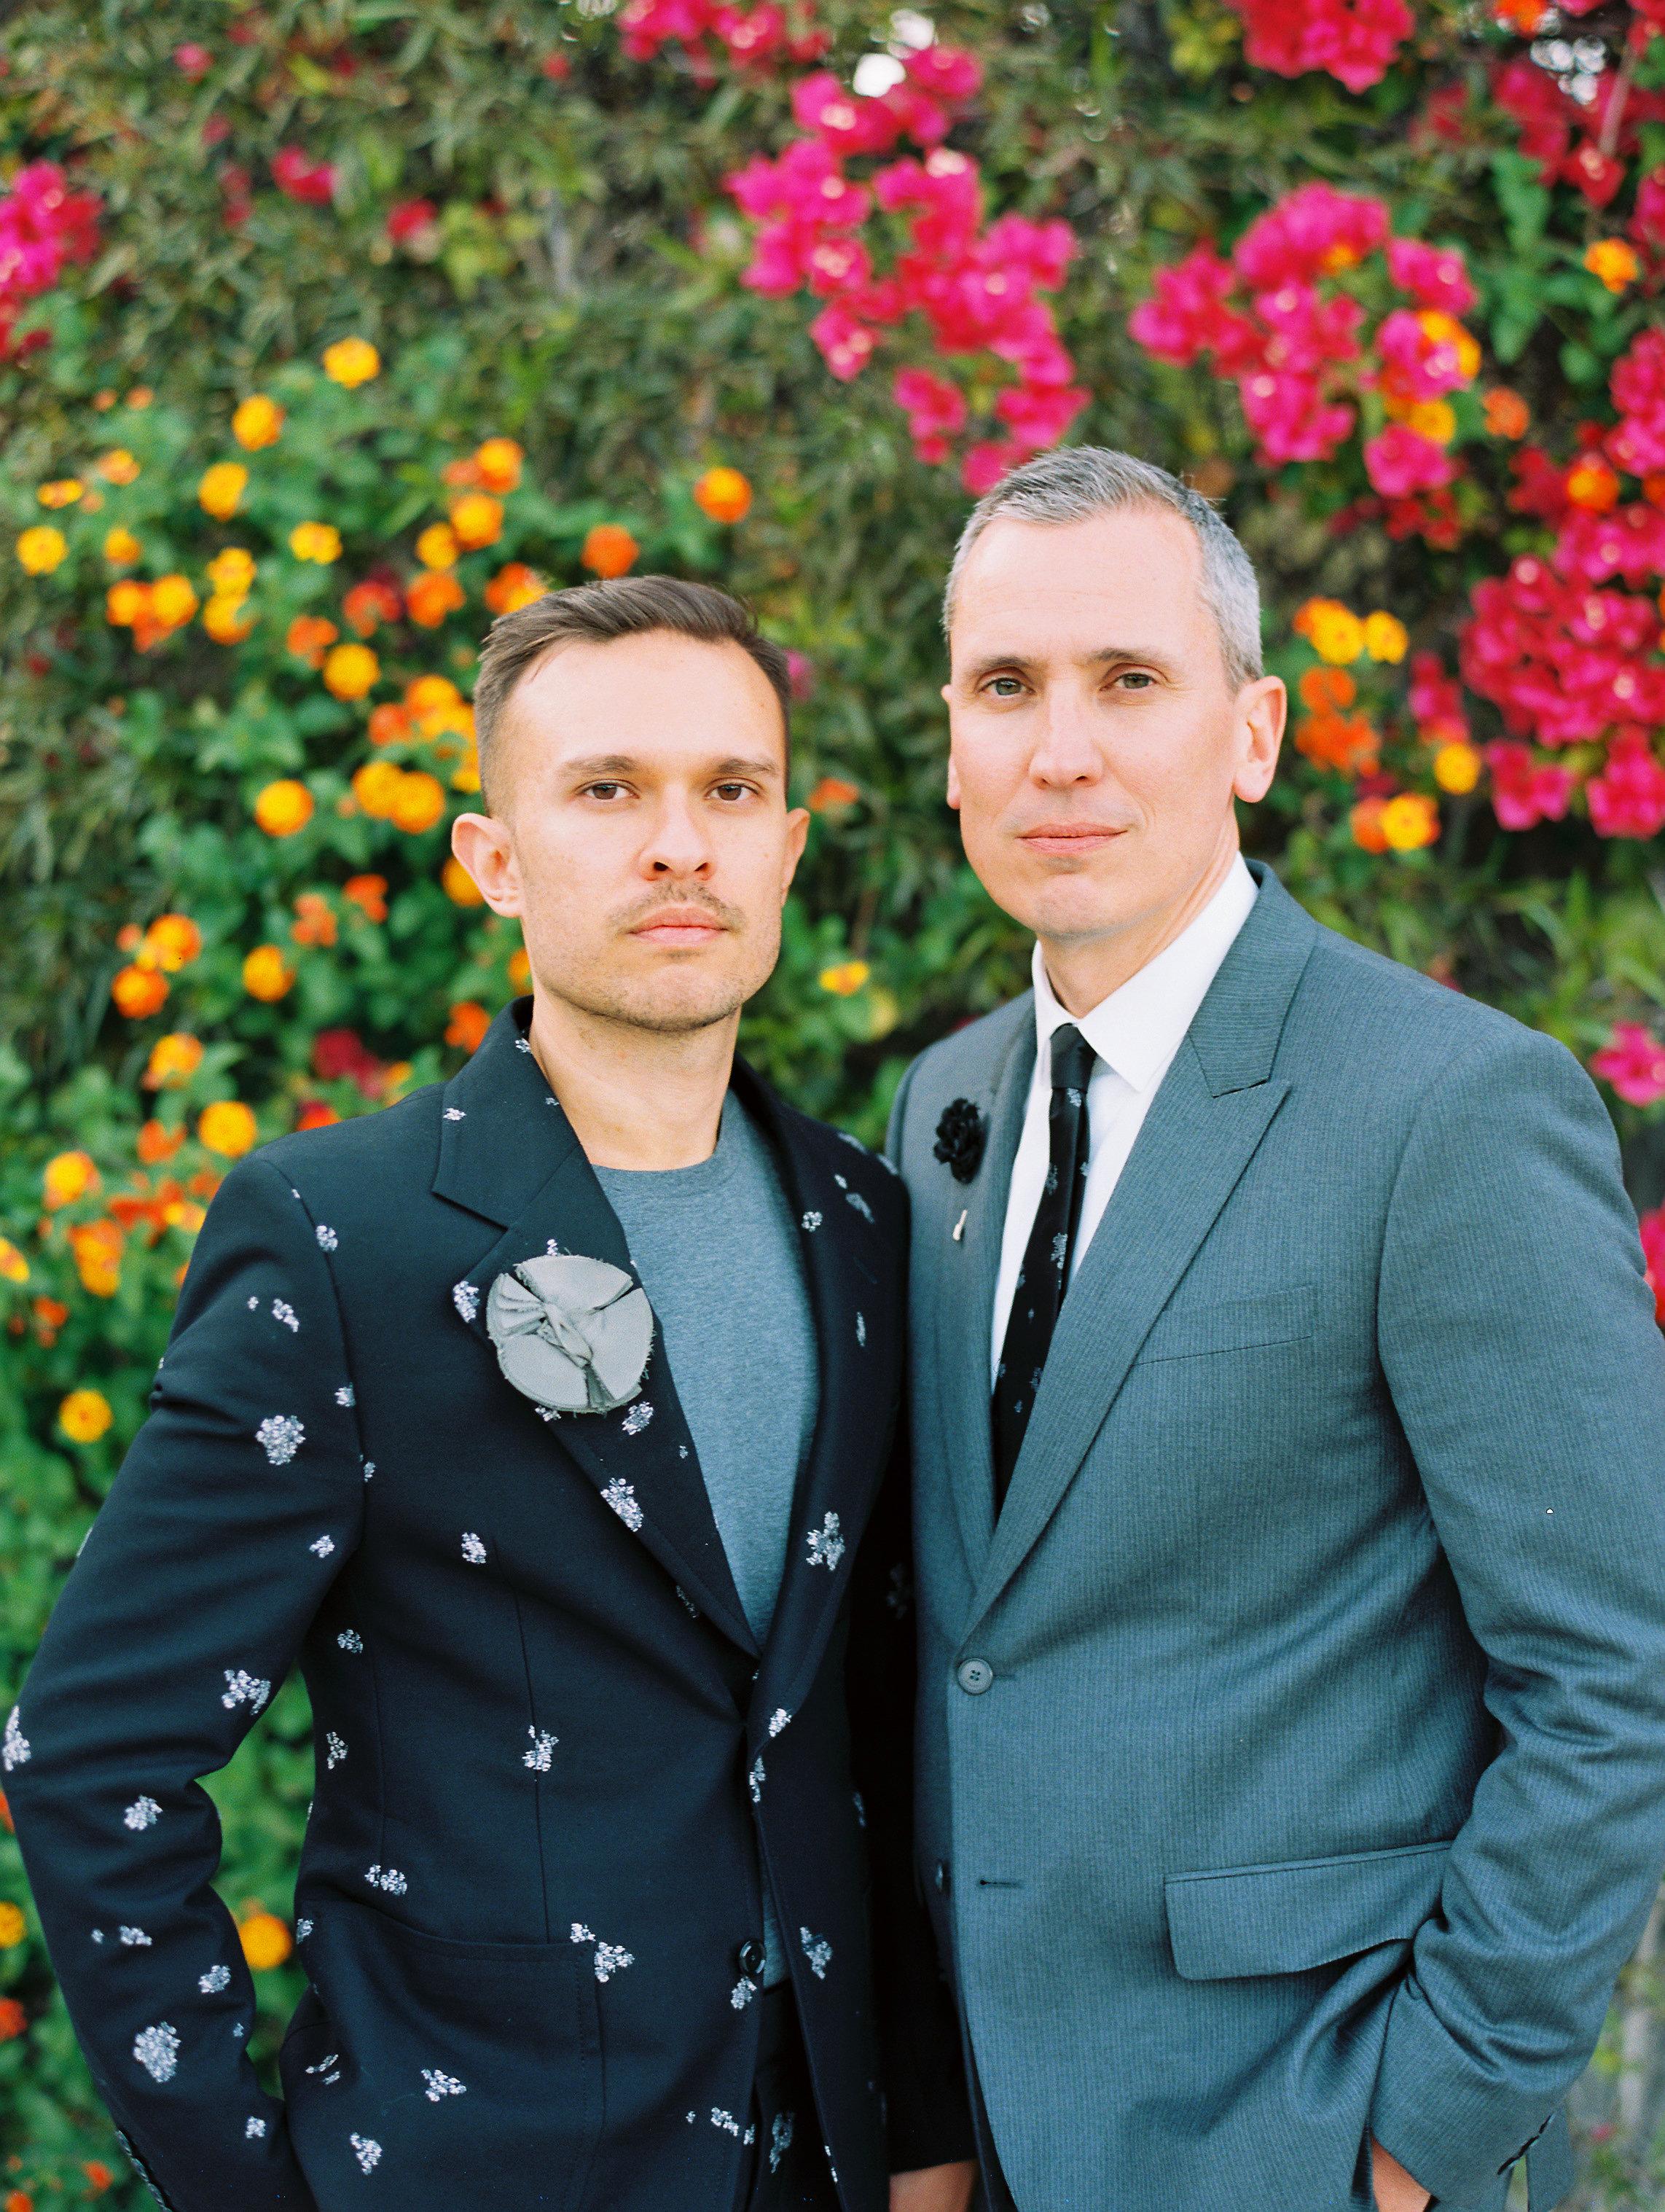 george shawn wedding grooms by flowers